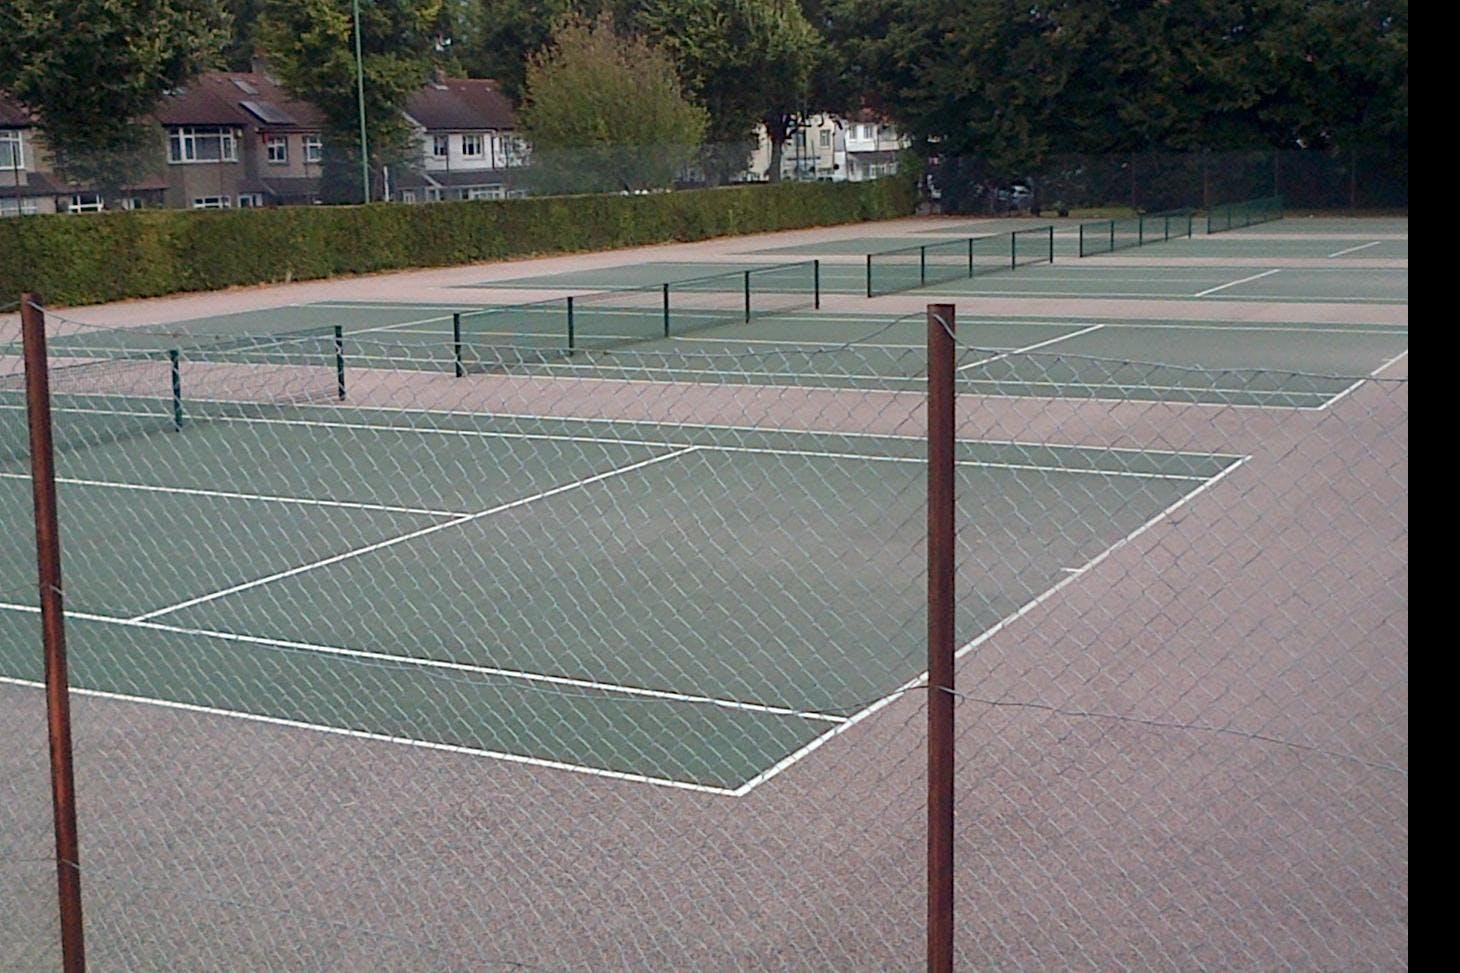 Carshalton Park Outdoor | Hard (macadam) tennis court